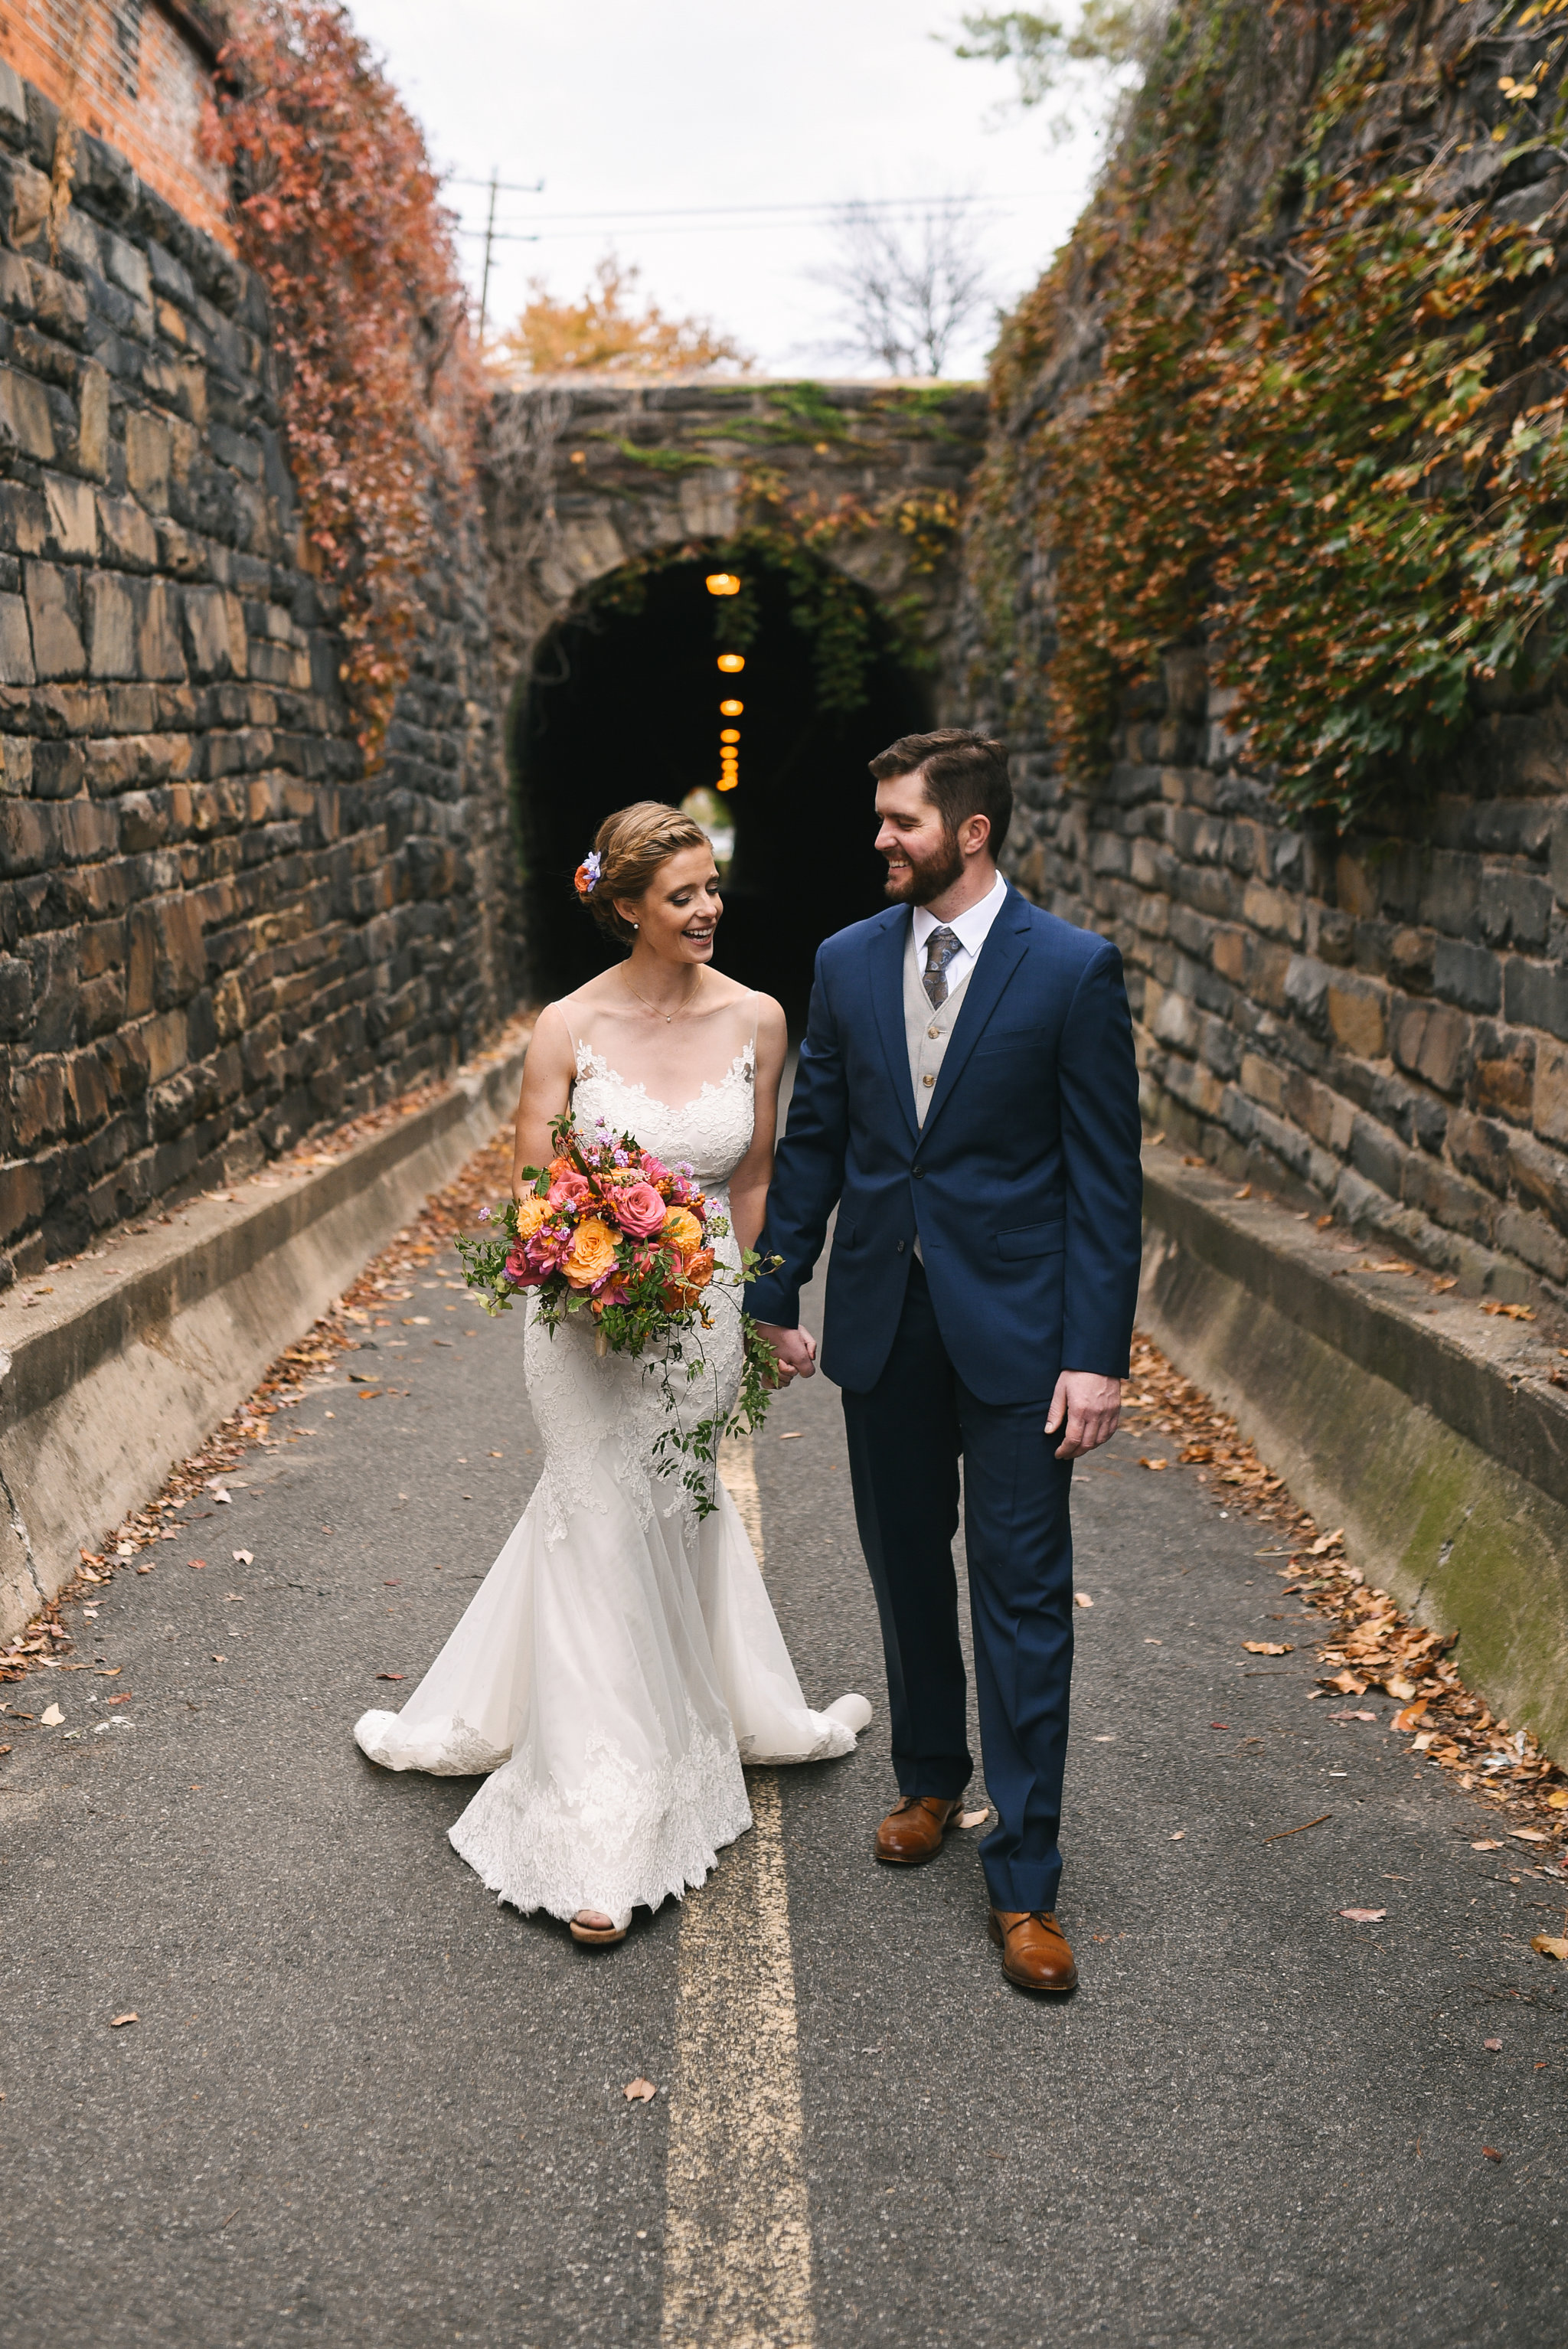 Alexandria, Virginia, Fall Wedding, Historic Wedding, Old Town, DC, Wilkes Street Tunnel, Romantic, Lian Carlo Wedding Dress, Secluded Moments, The Enchanted Florist Bouquet, DC Wedding Photographer